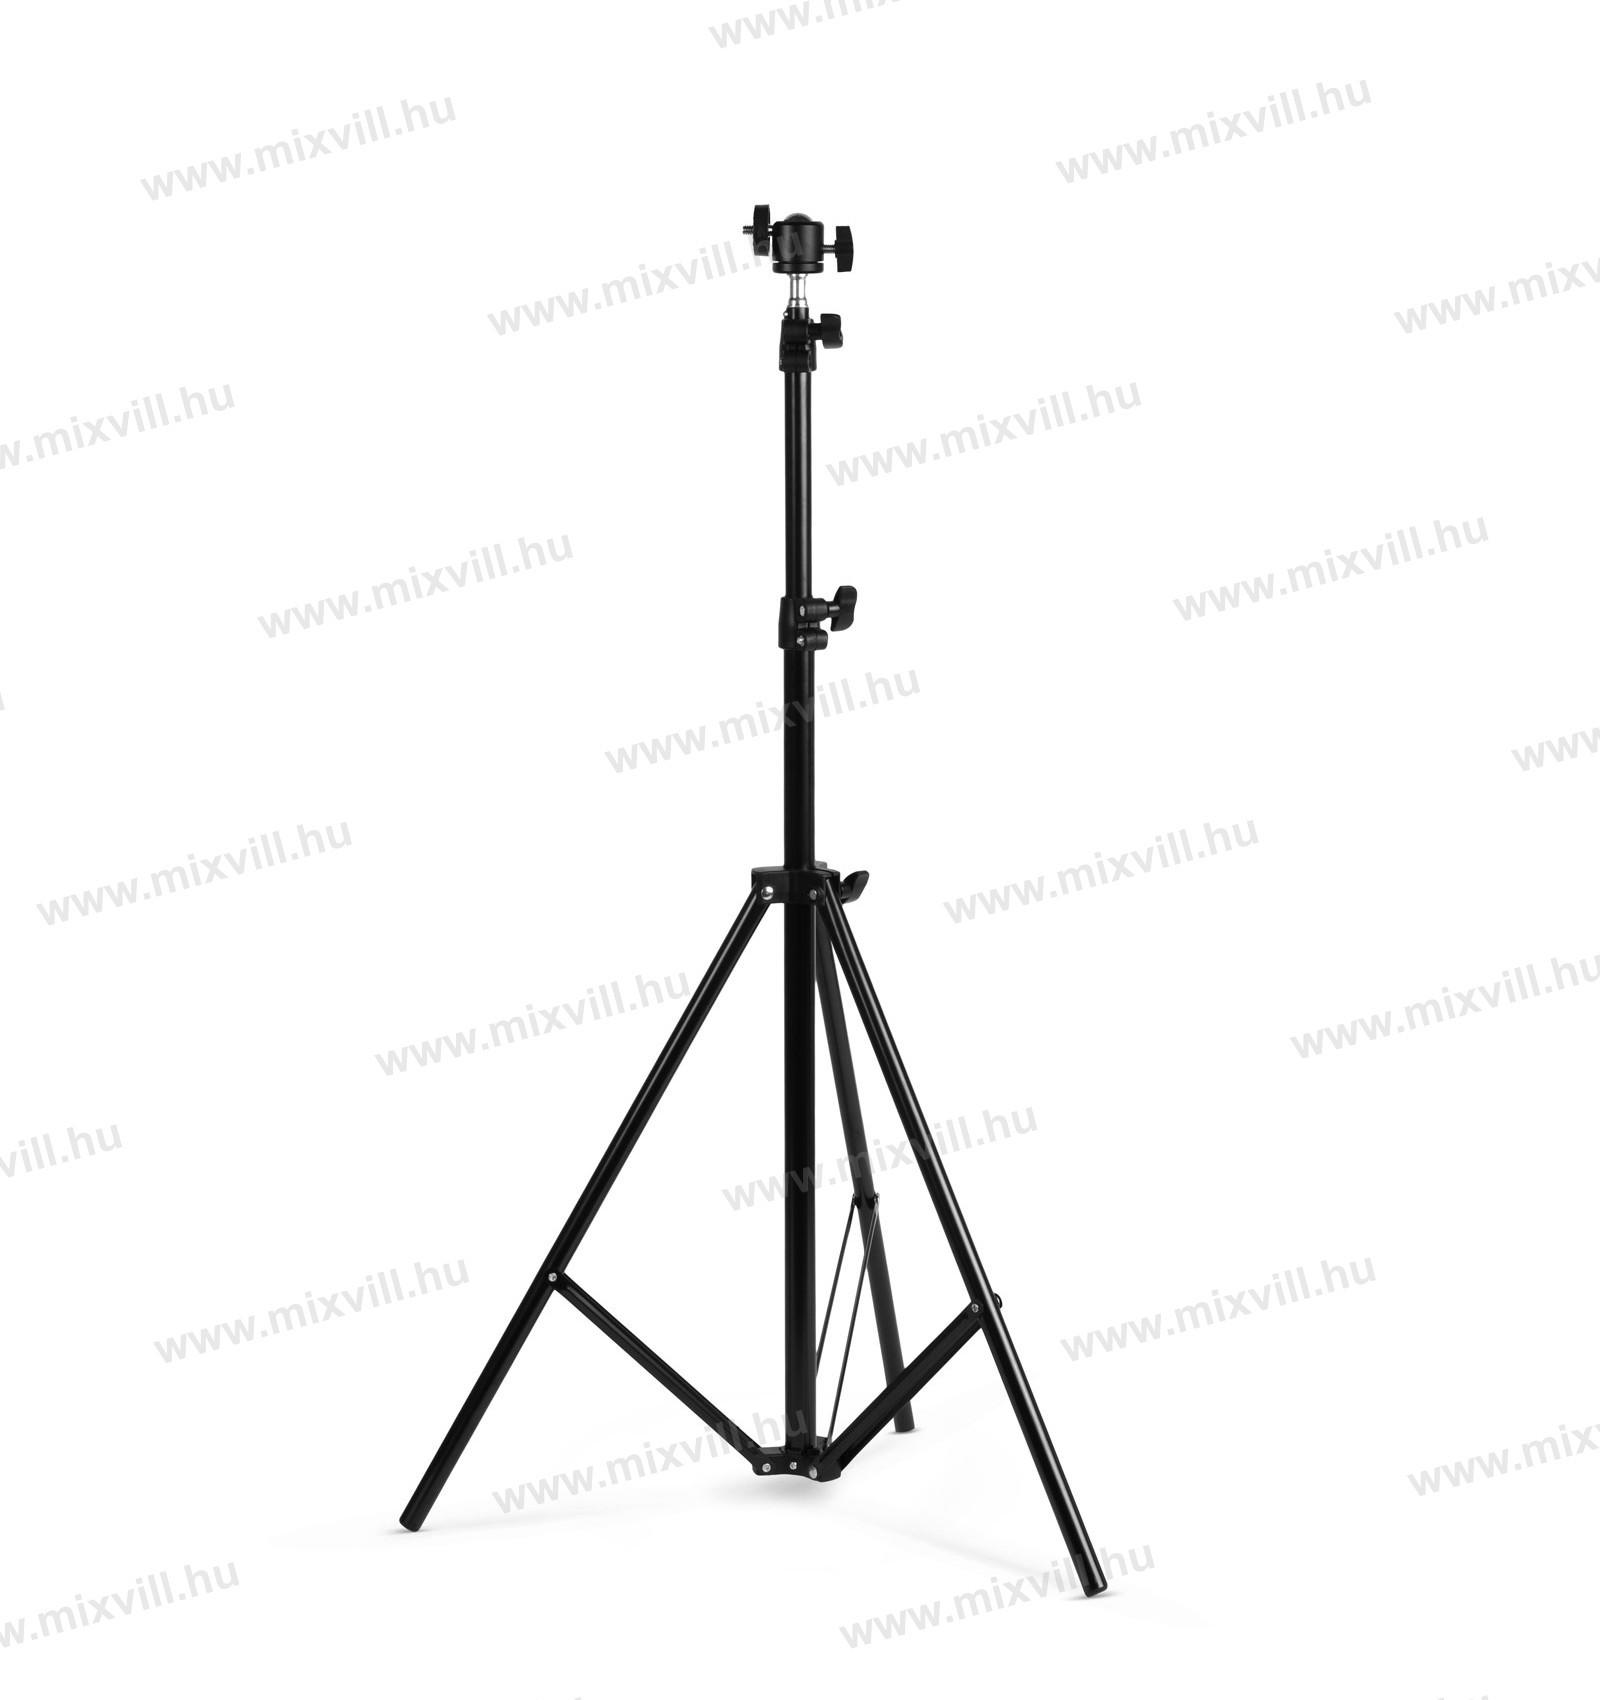 allvany-tripod-reflektor-aluminium-magassag-210cm-18649B